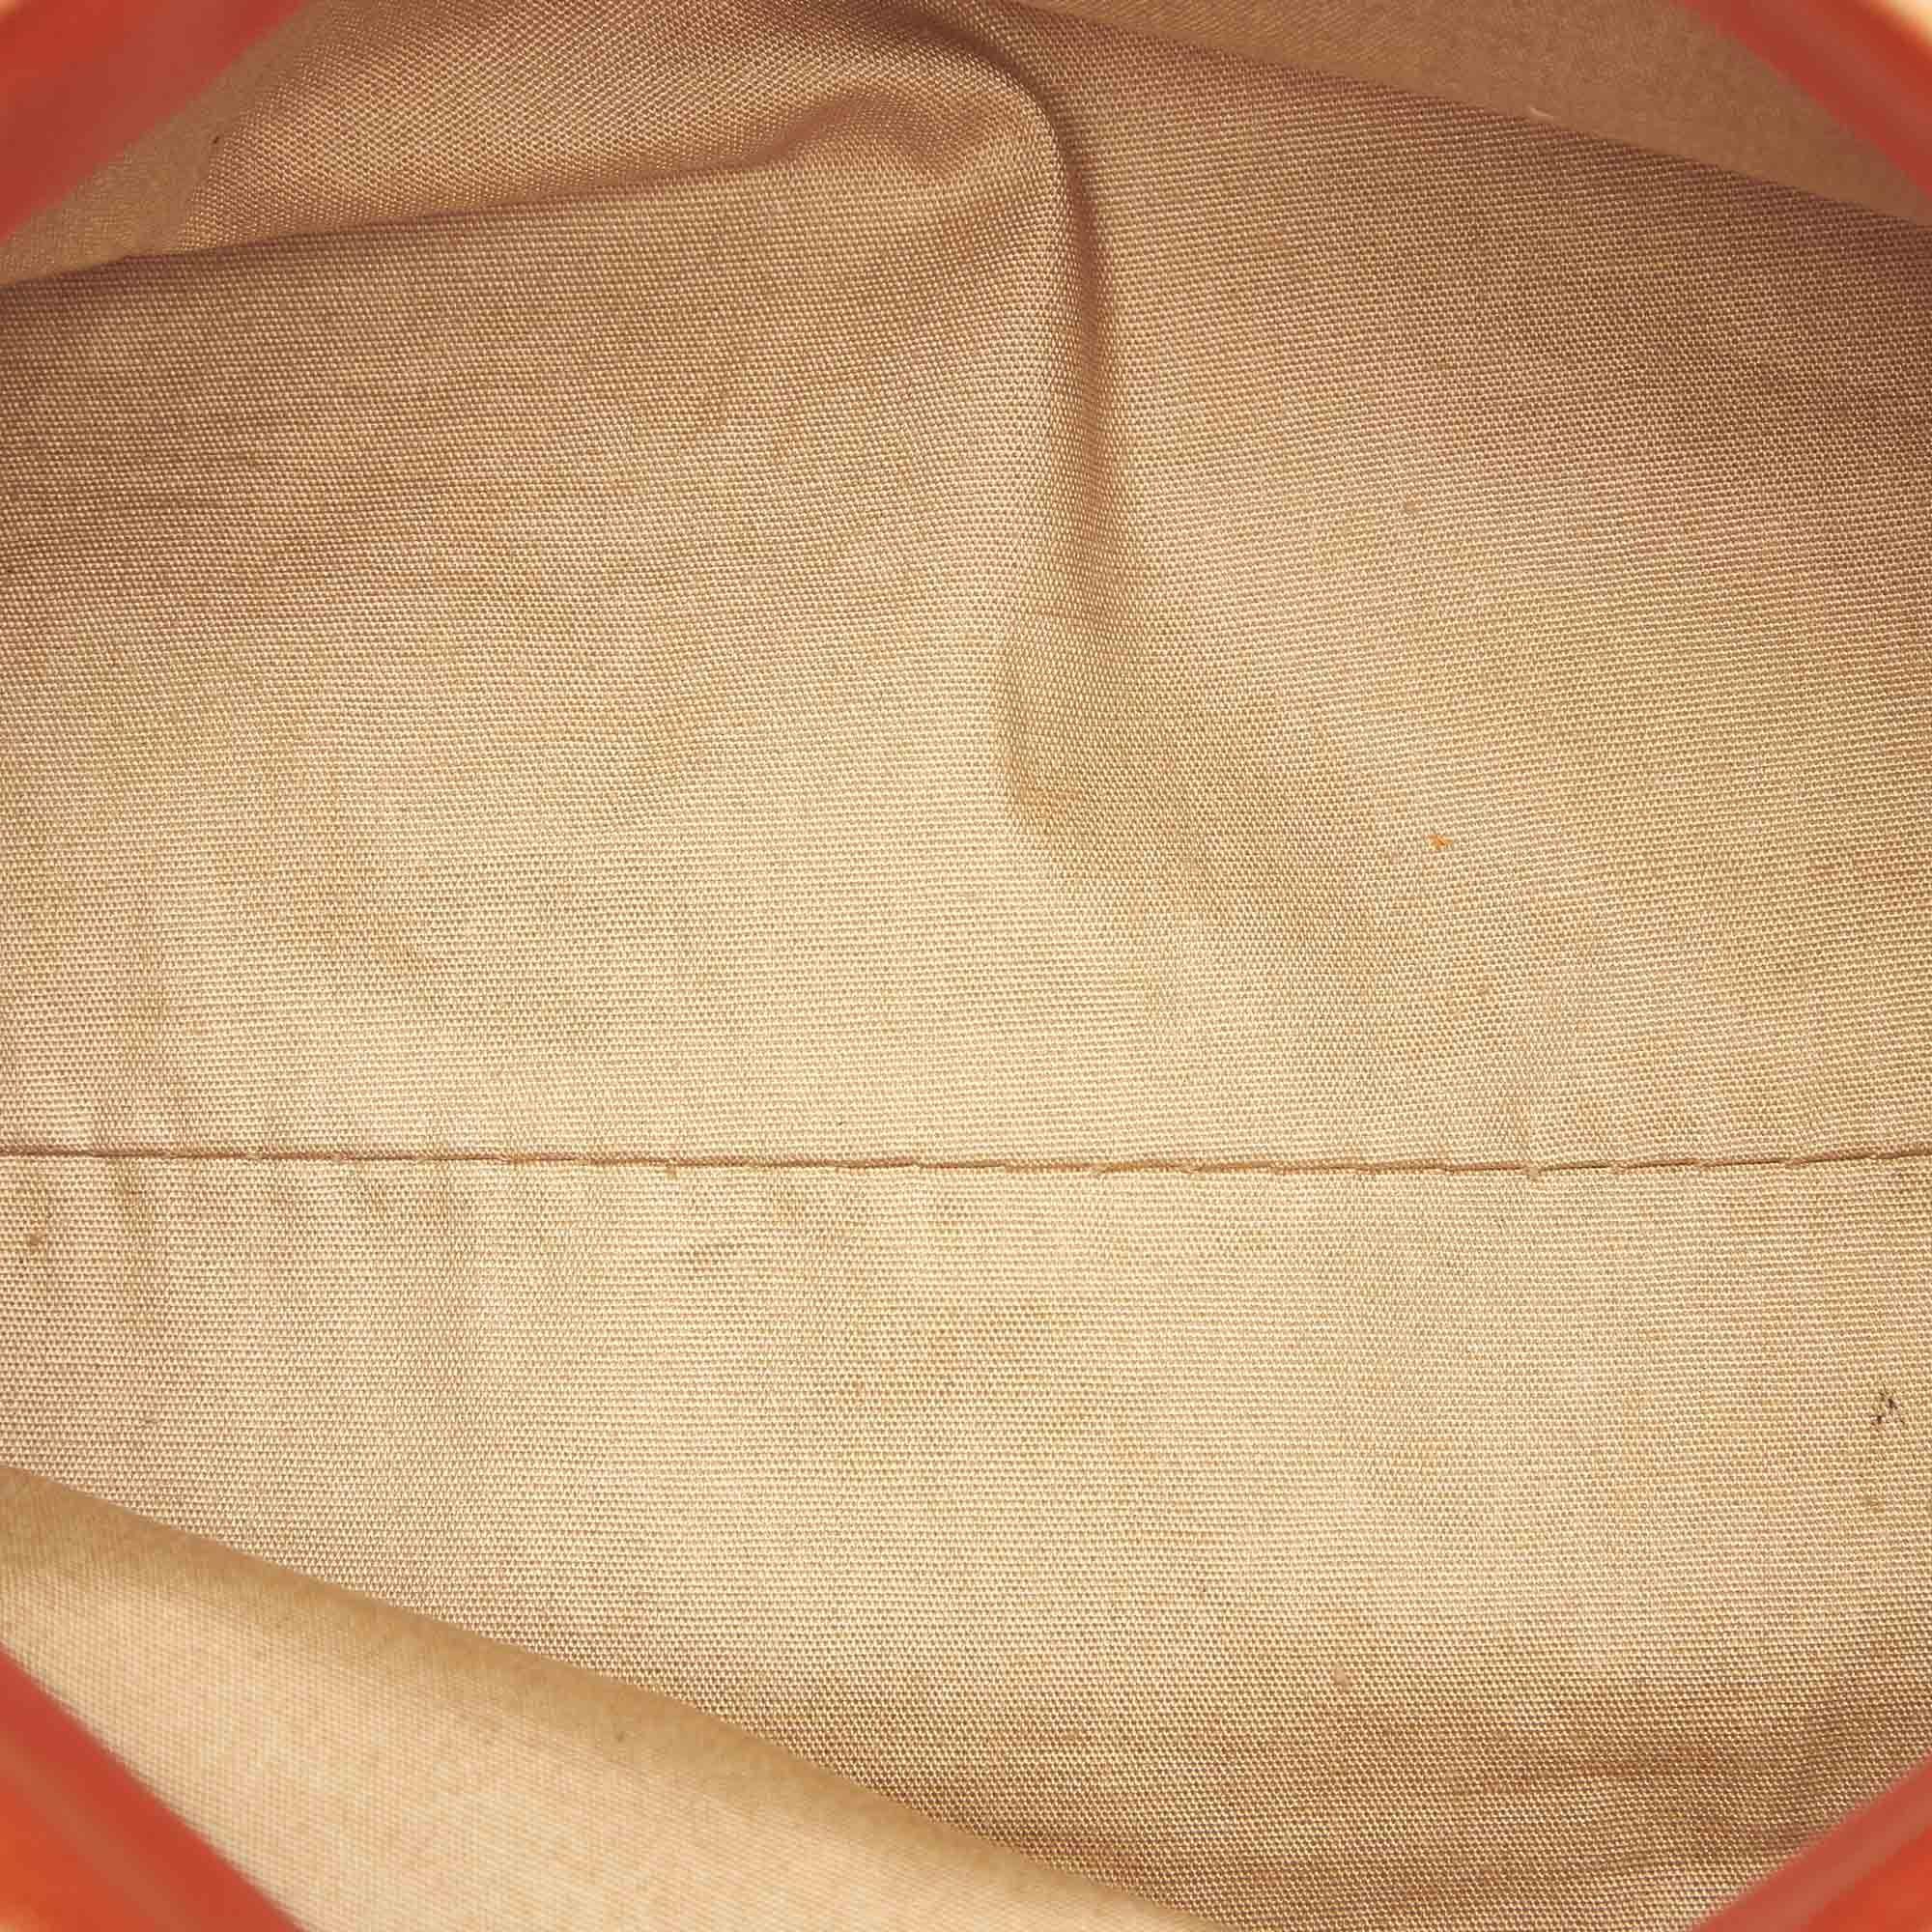 Vintage Bottega Veneta Canvas Baguette Brown